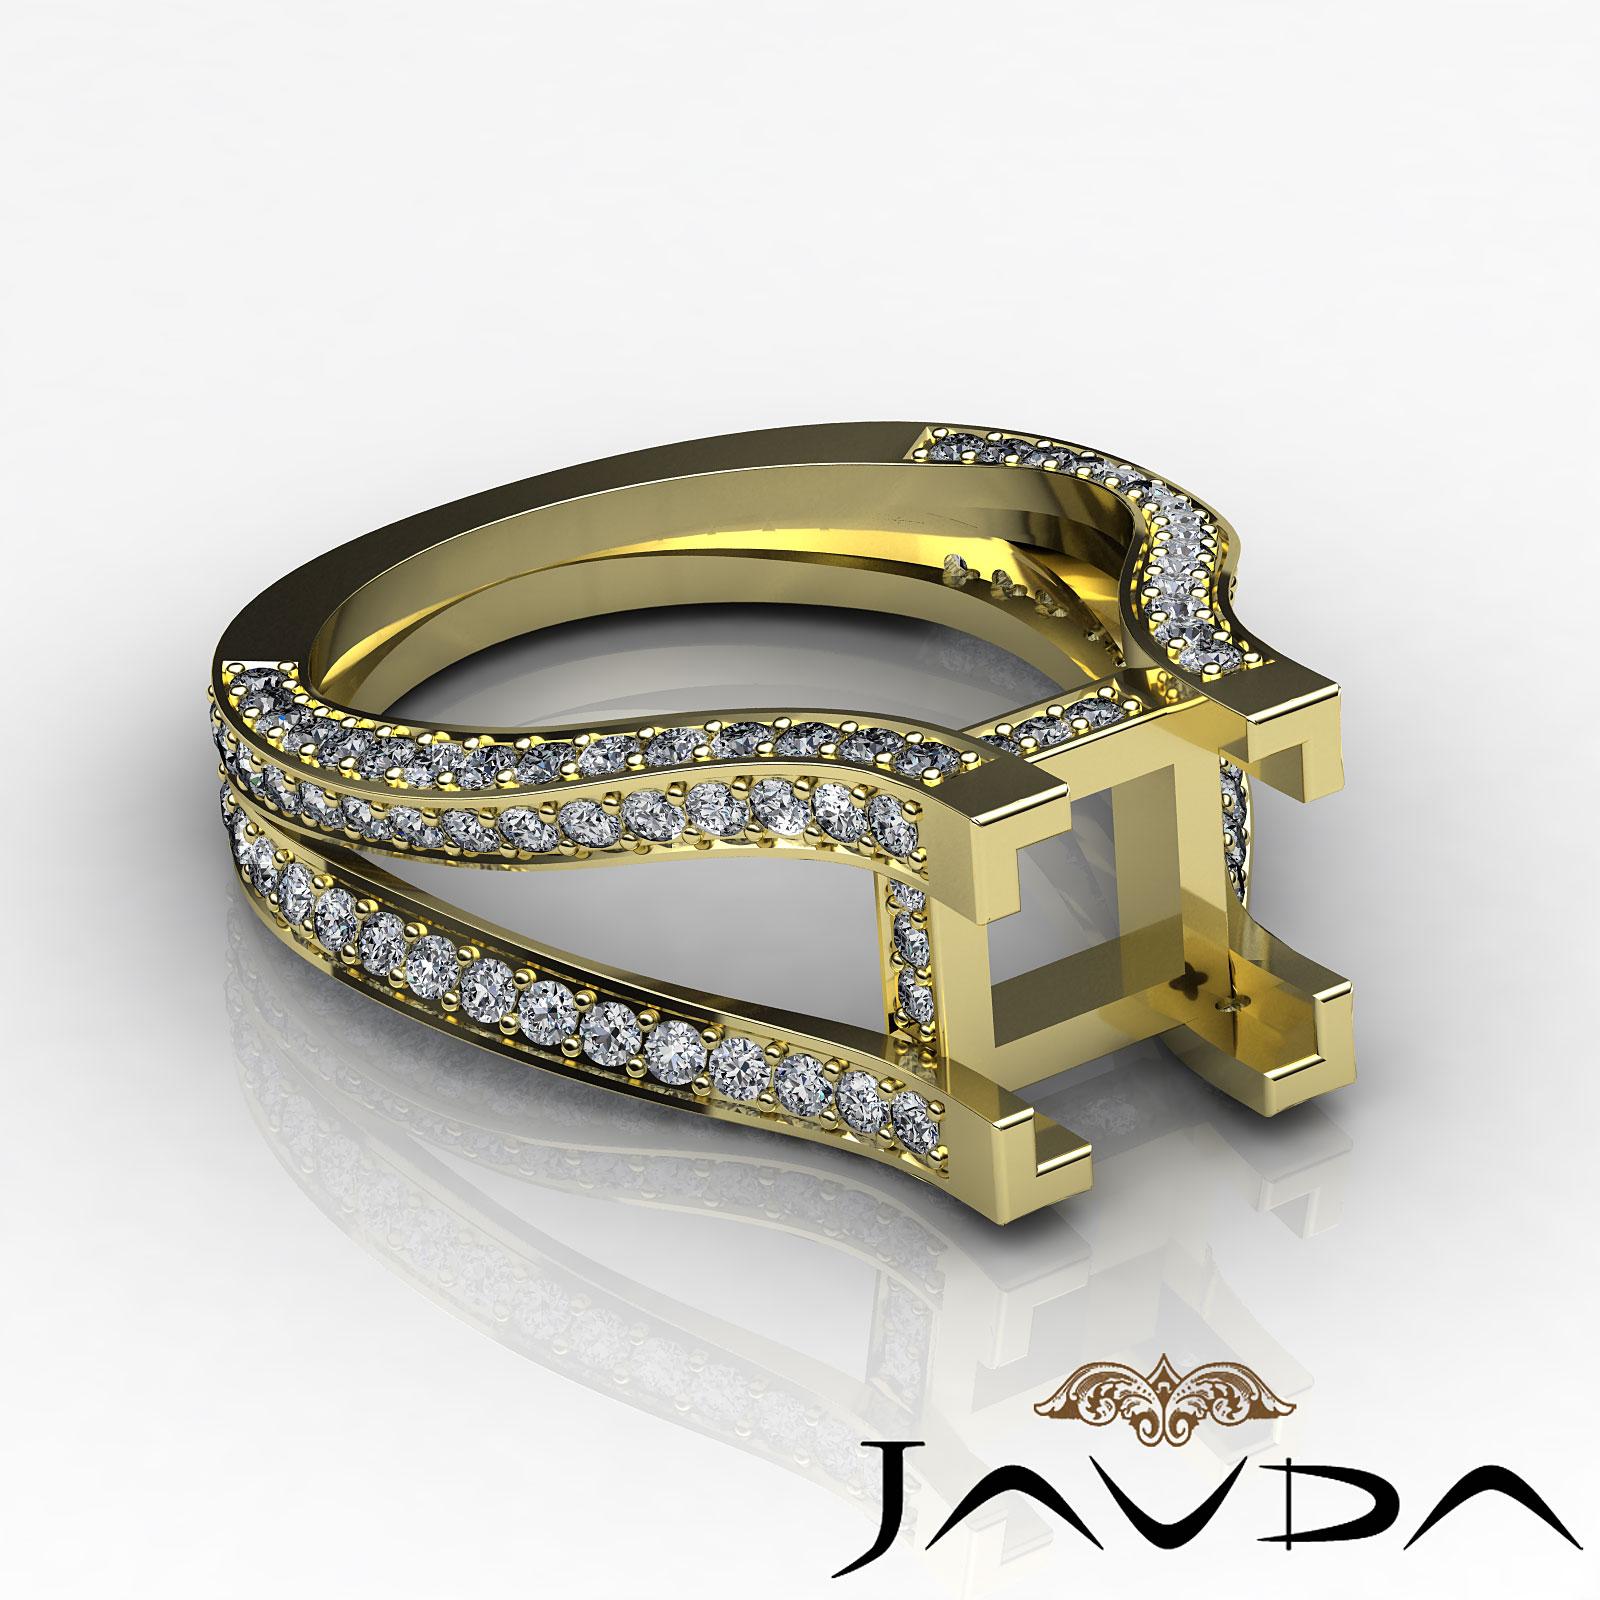 Diamond Engagement Ring 14k Yellow Gold Princess Semi Mount Pave Setting 1 4C